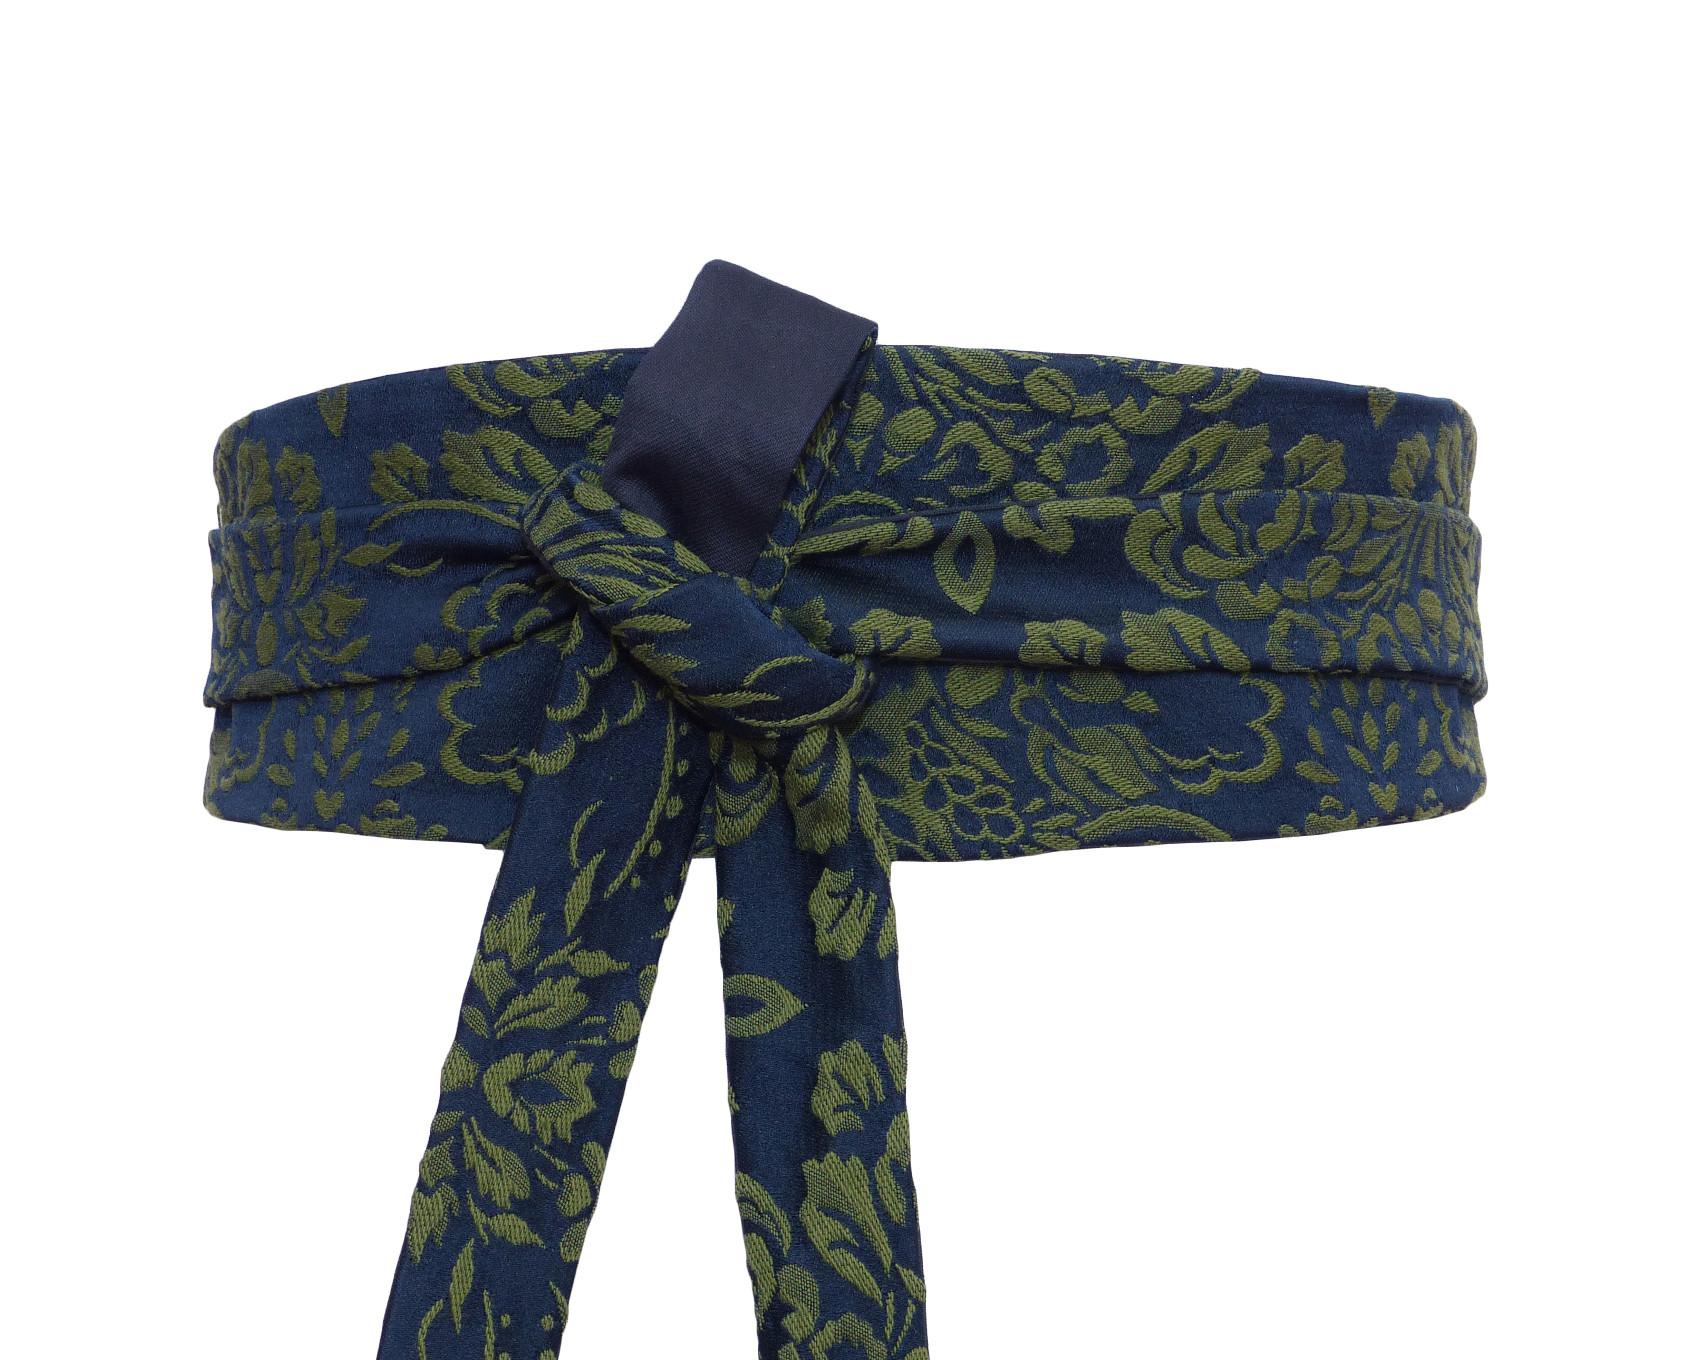 58914fa1beea Ceinture à nouer obi, Brocart Soie Bleu Marine   Vert – Polina Couture